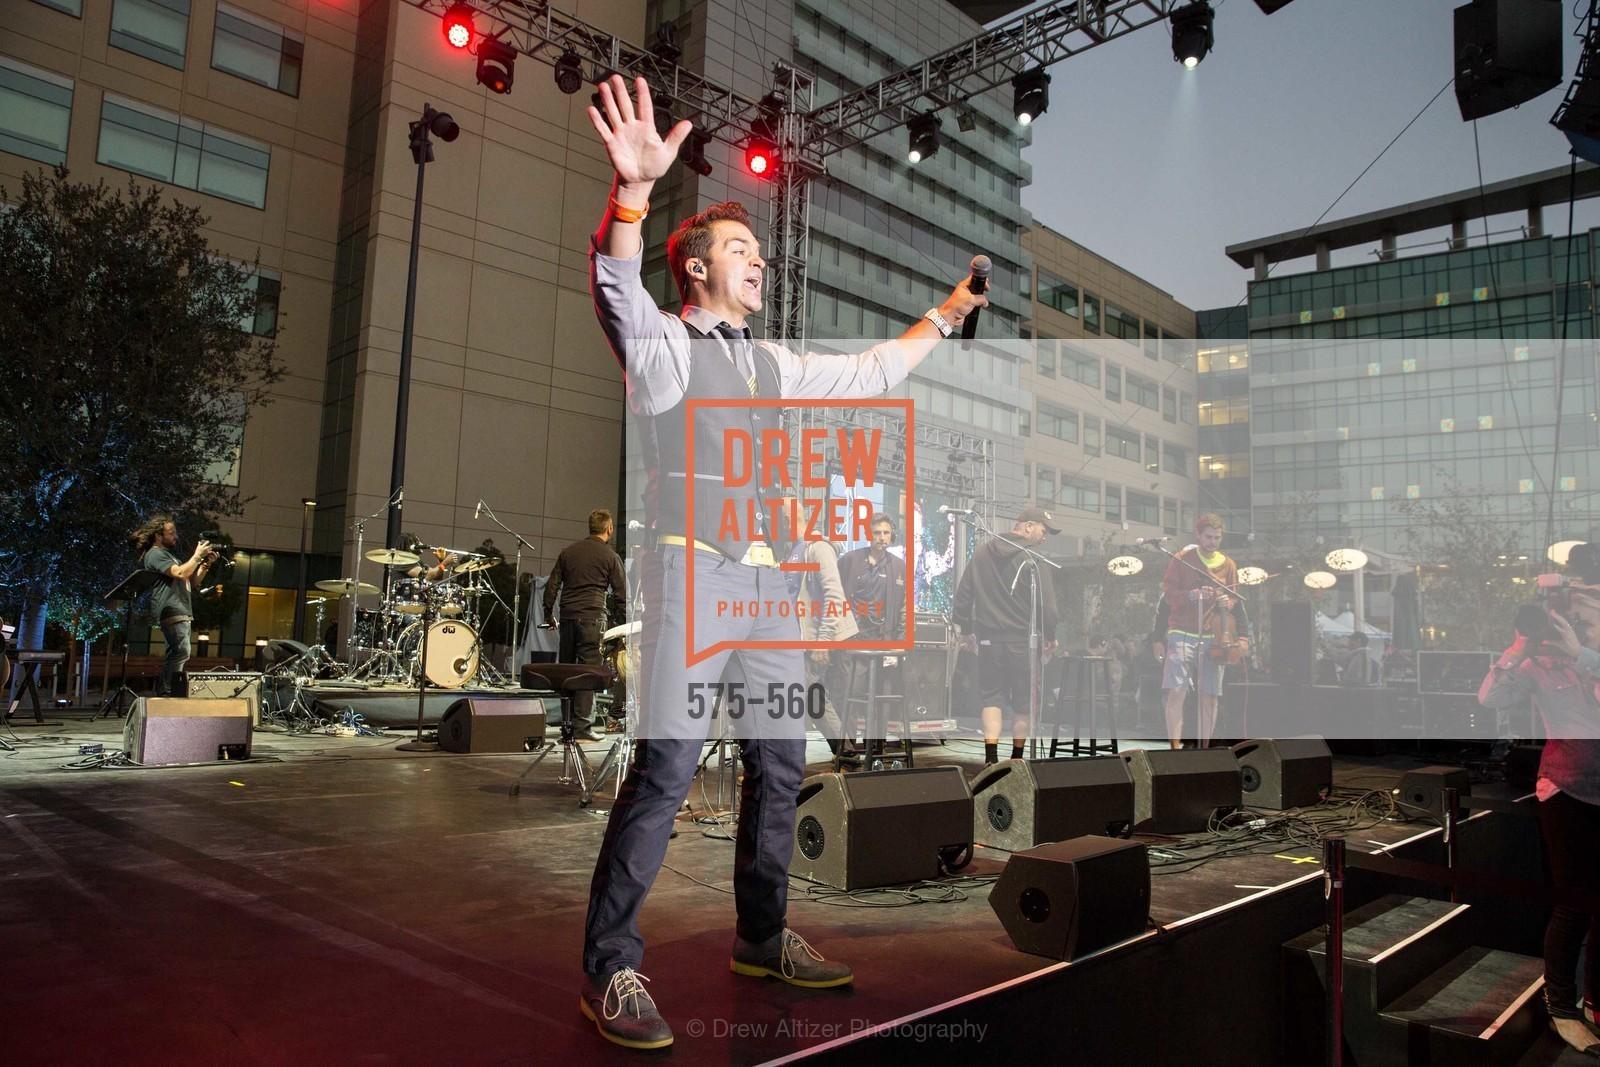 Performance By DJ Cory Live!, Photo #575-560